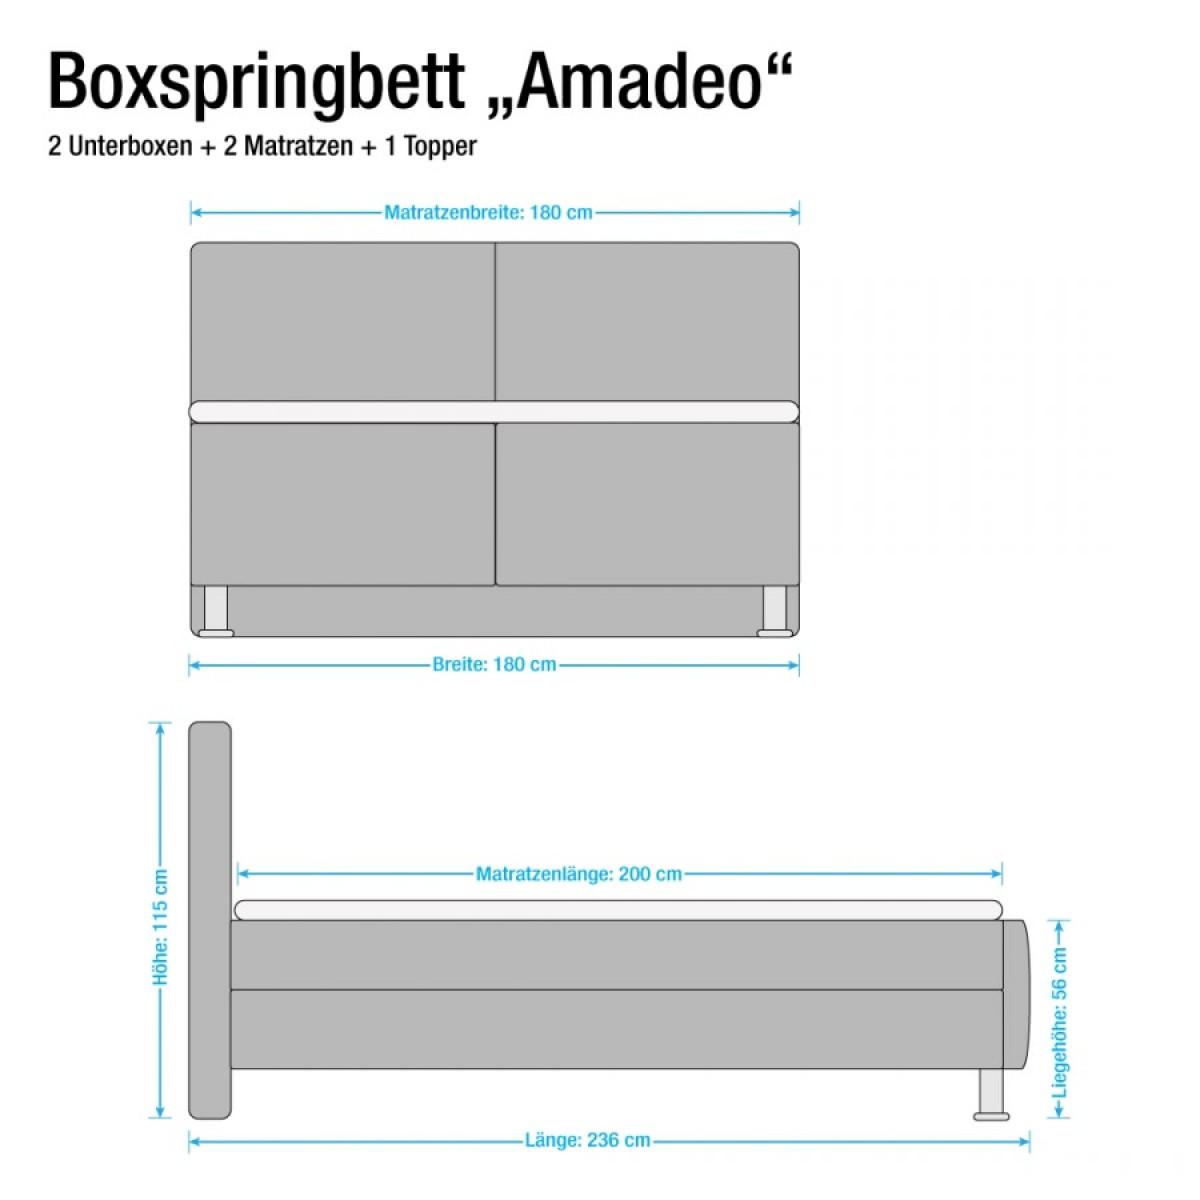 Boxspringbett Amadeo Übersicht